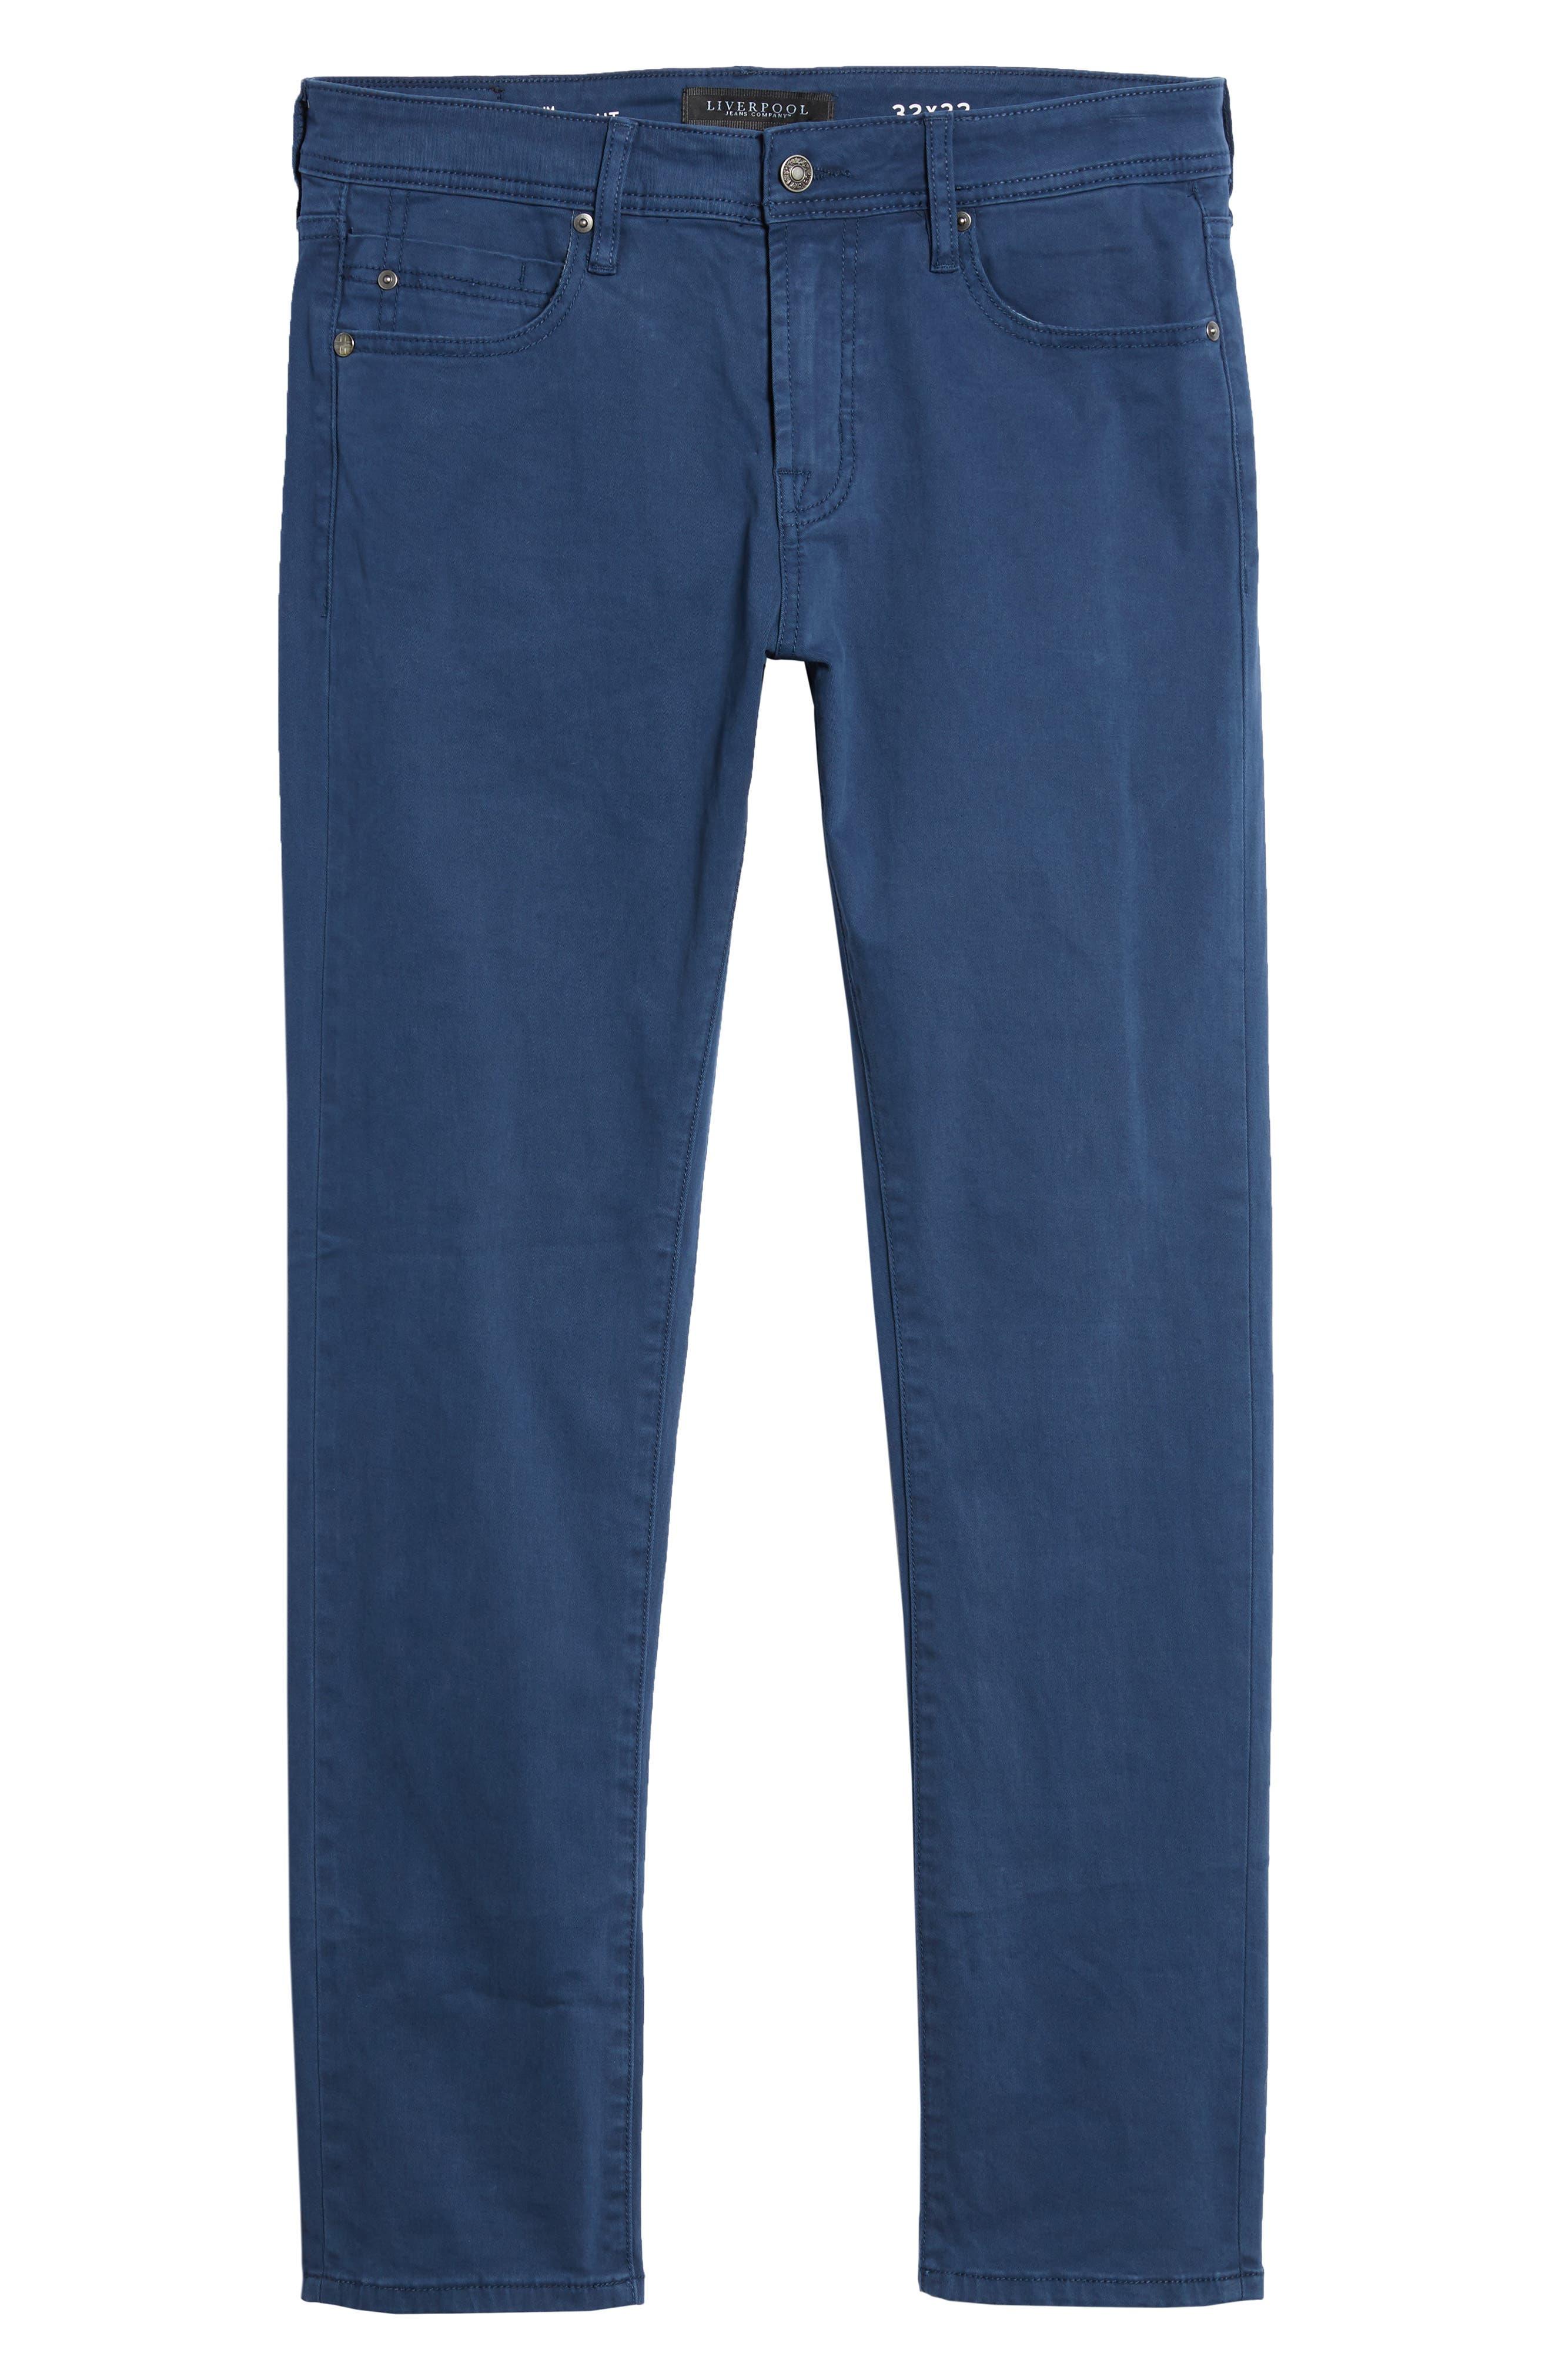 Jeans Co. Kingston Slim Straight Leg Jeans,                             Alternate thumbnail 6, color,                             BLUE TWILIGHT